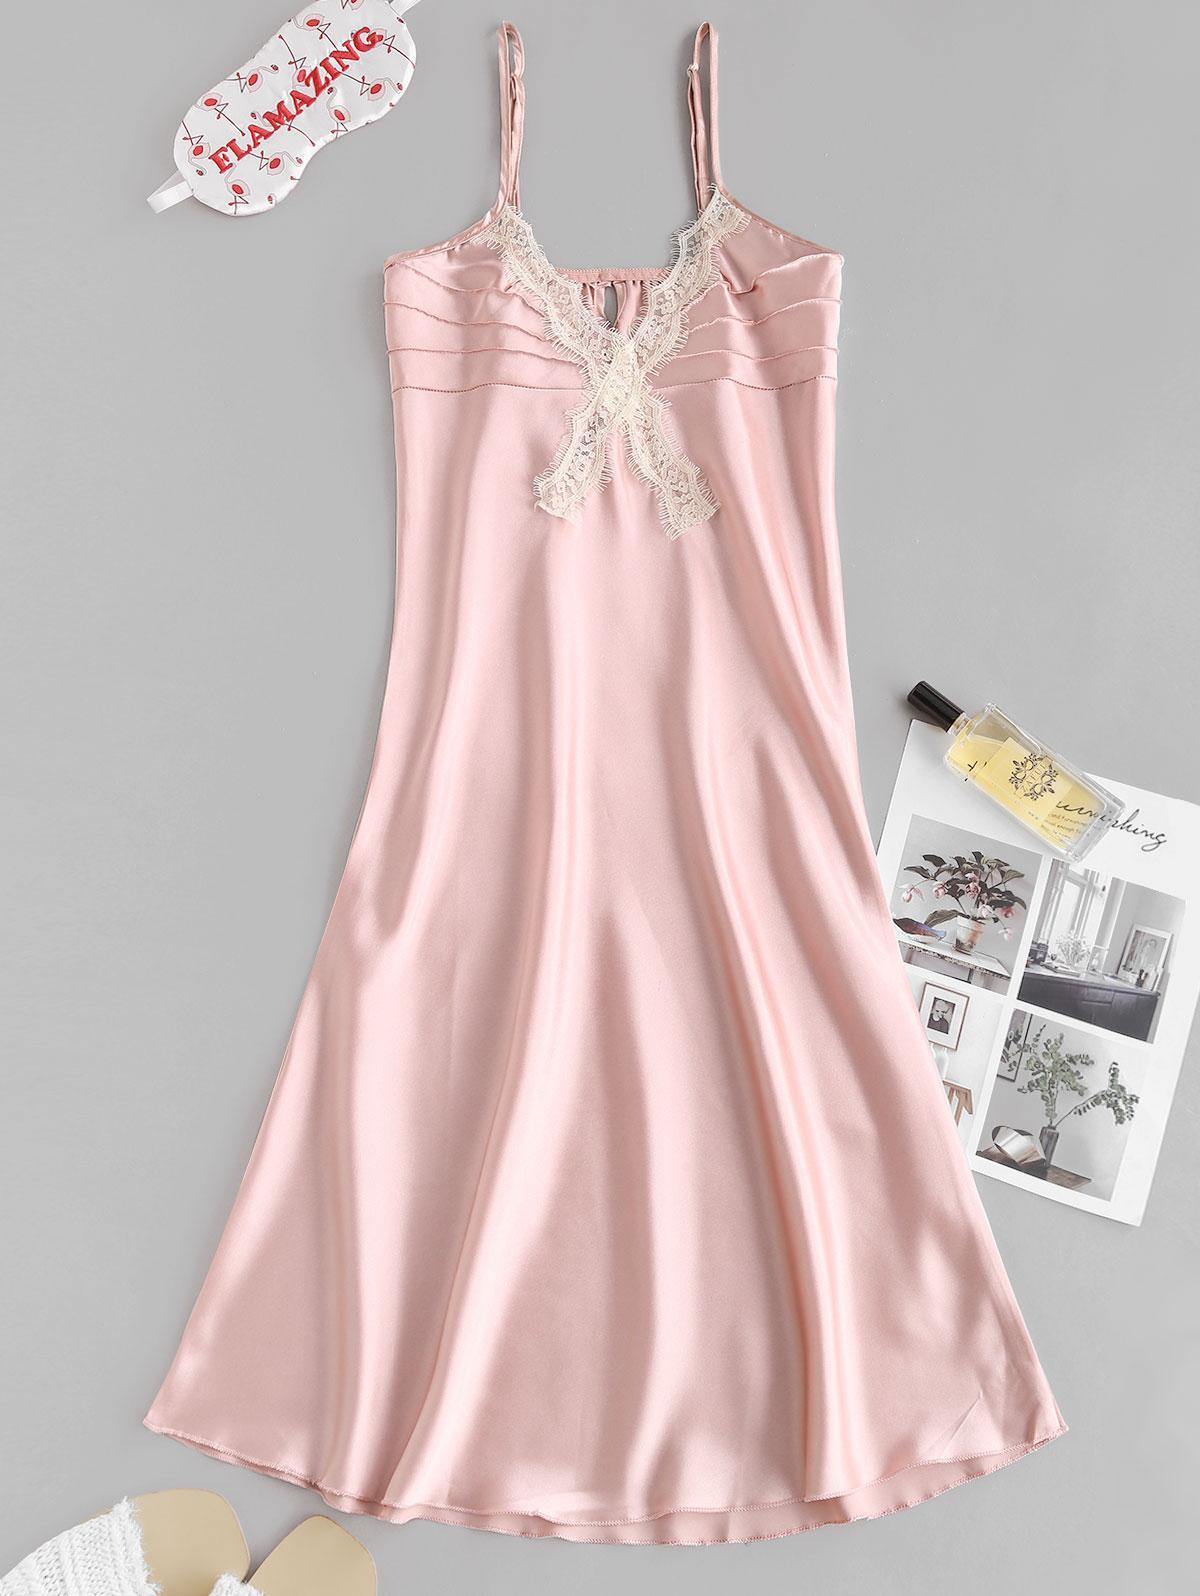 Lace Insert Satin Pintuck Pajama Dress